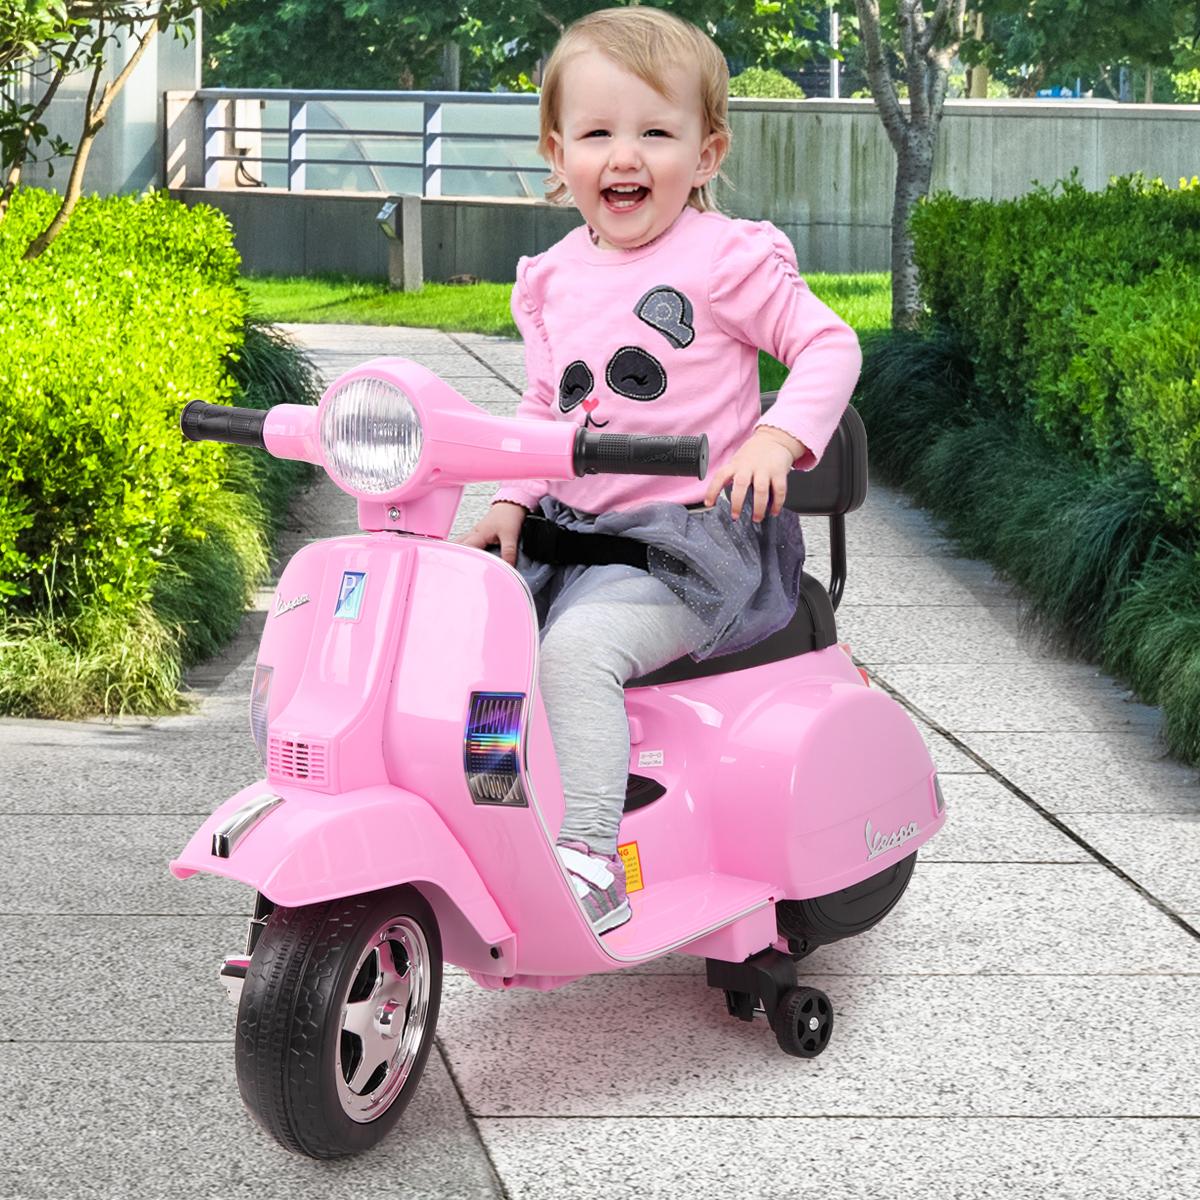 Vespa Licensed 6V Kids Motorcycle Bike, Horn TH17W0478 cj2